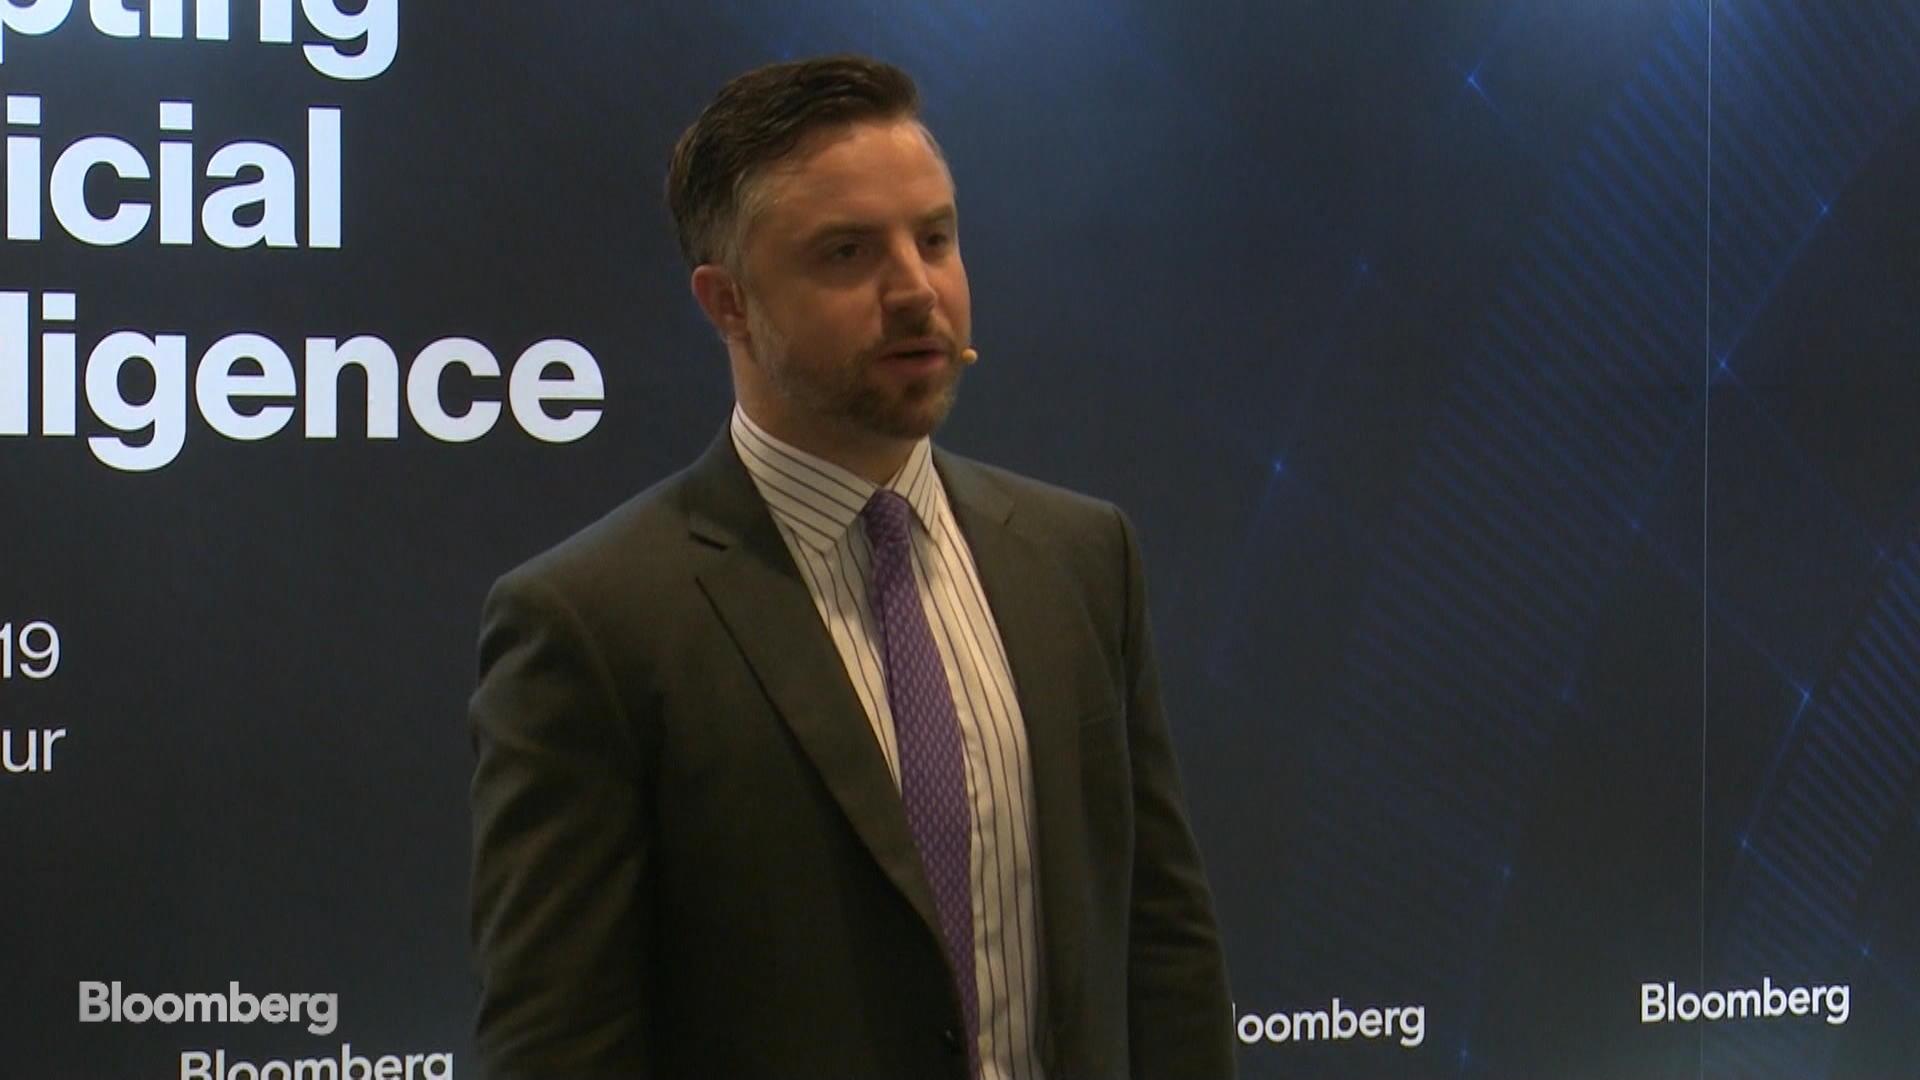 Adopting Artificial Intelligence: Welcoming Remarks